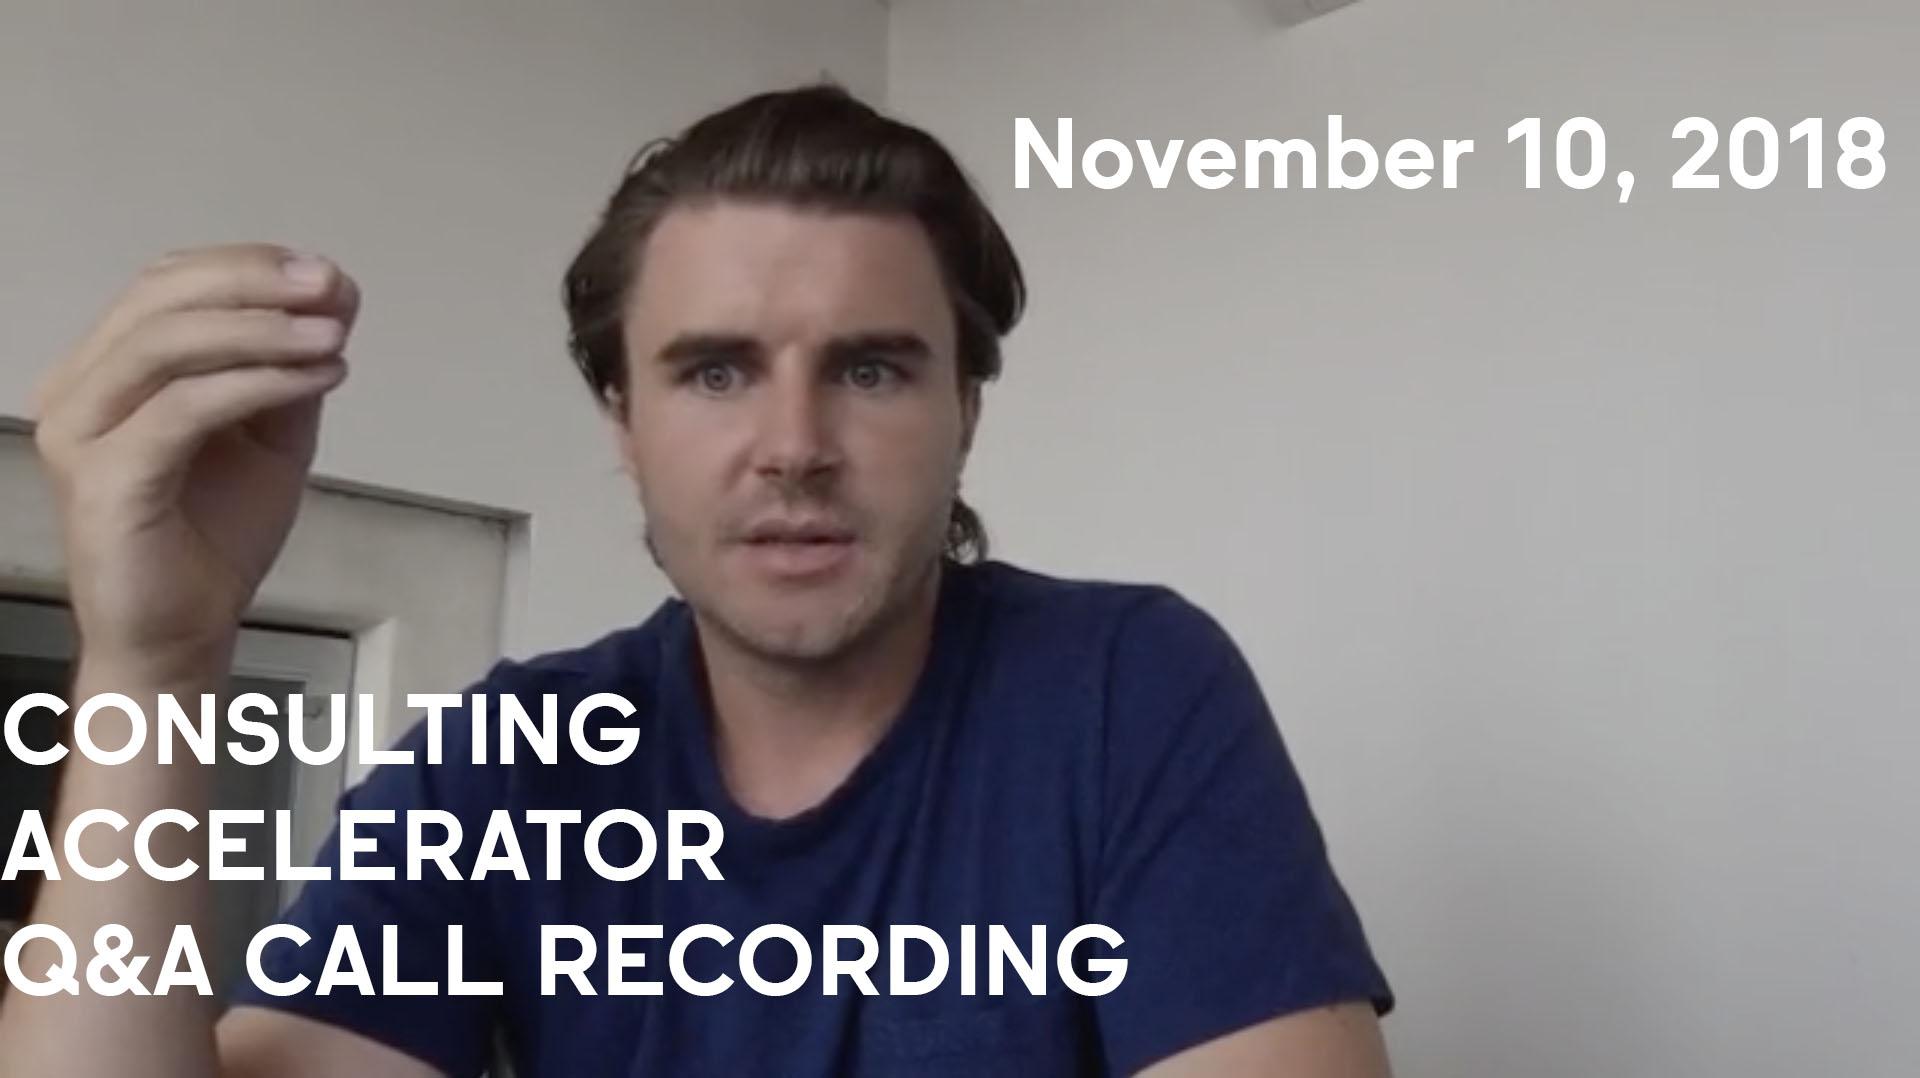 Consulting Accelerator Livestream Q&A, November 10th, 2018